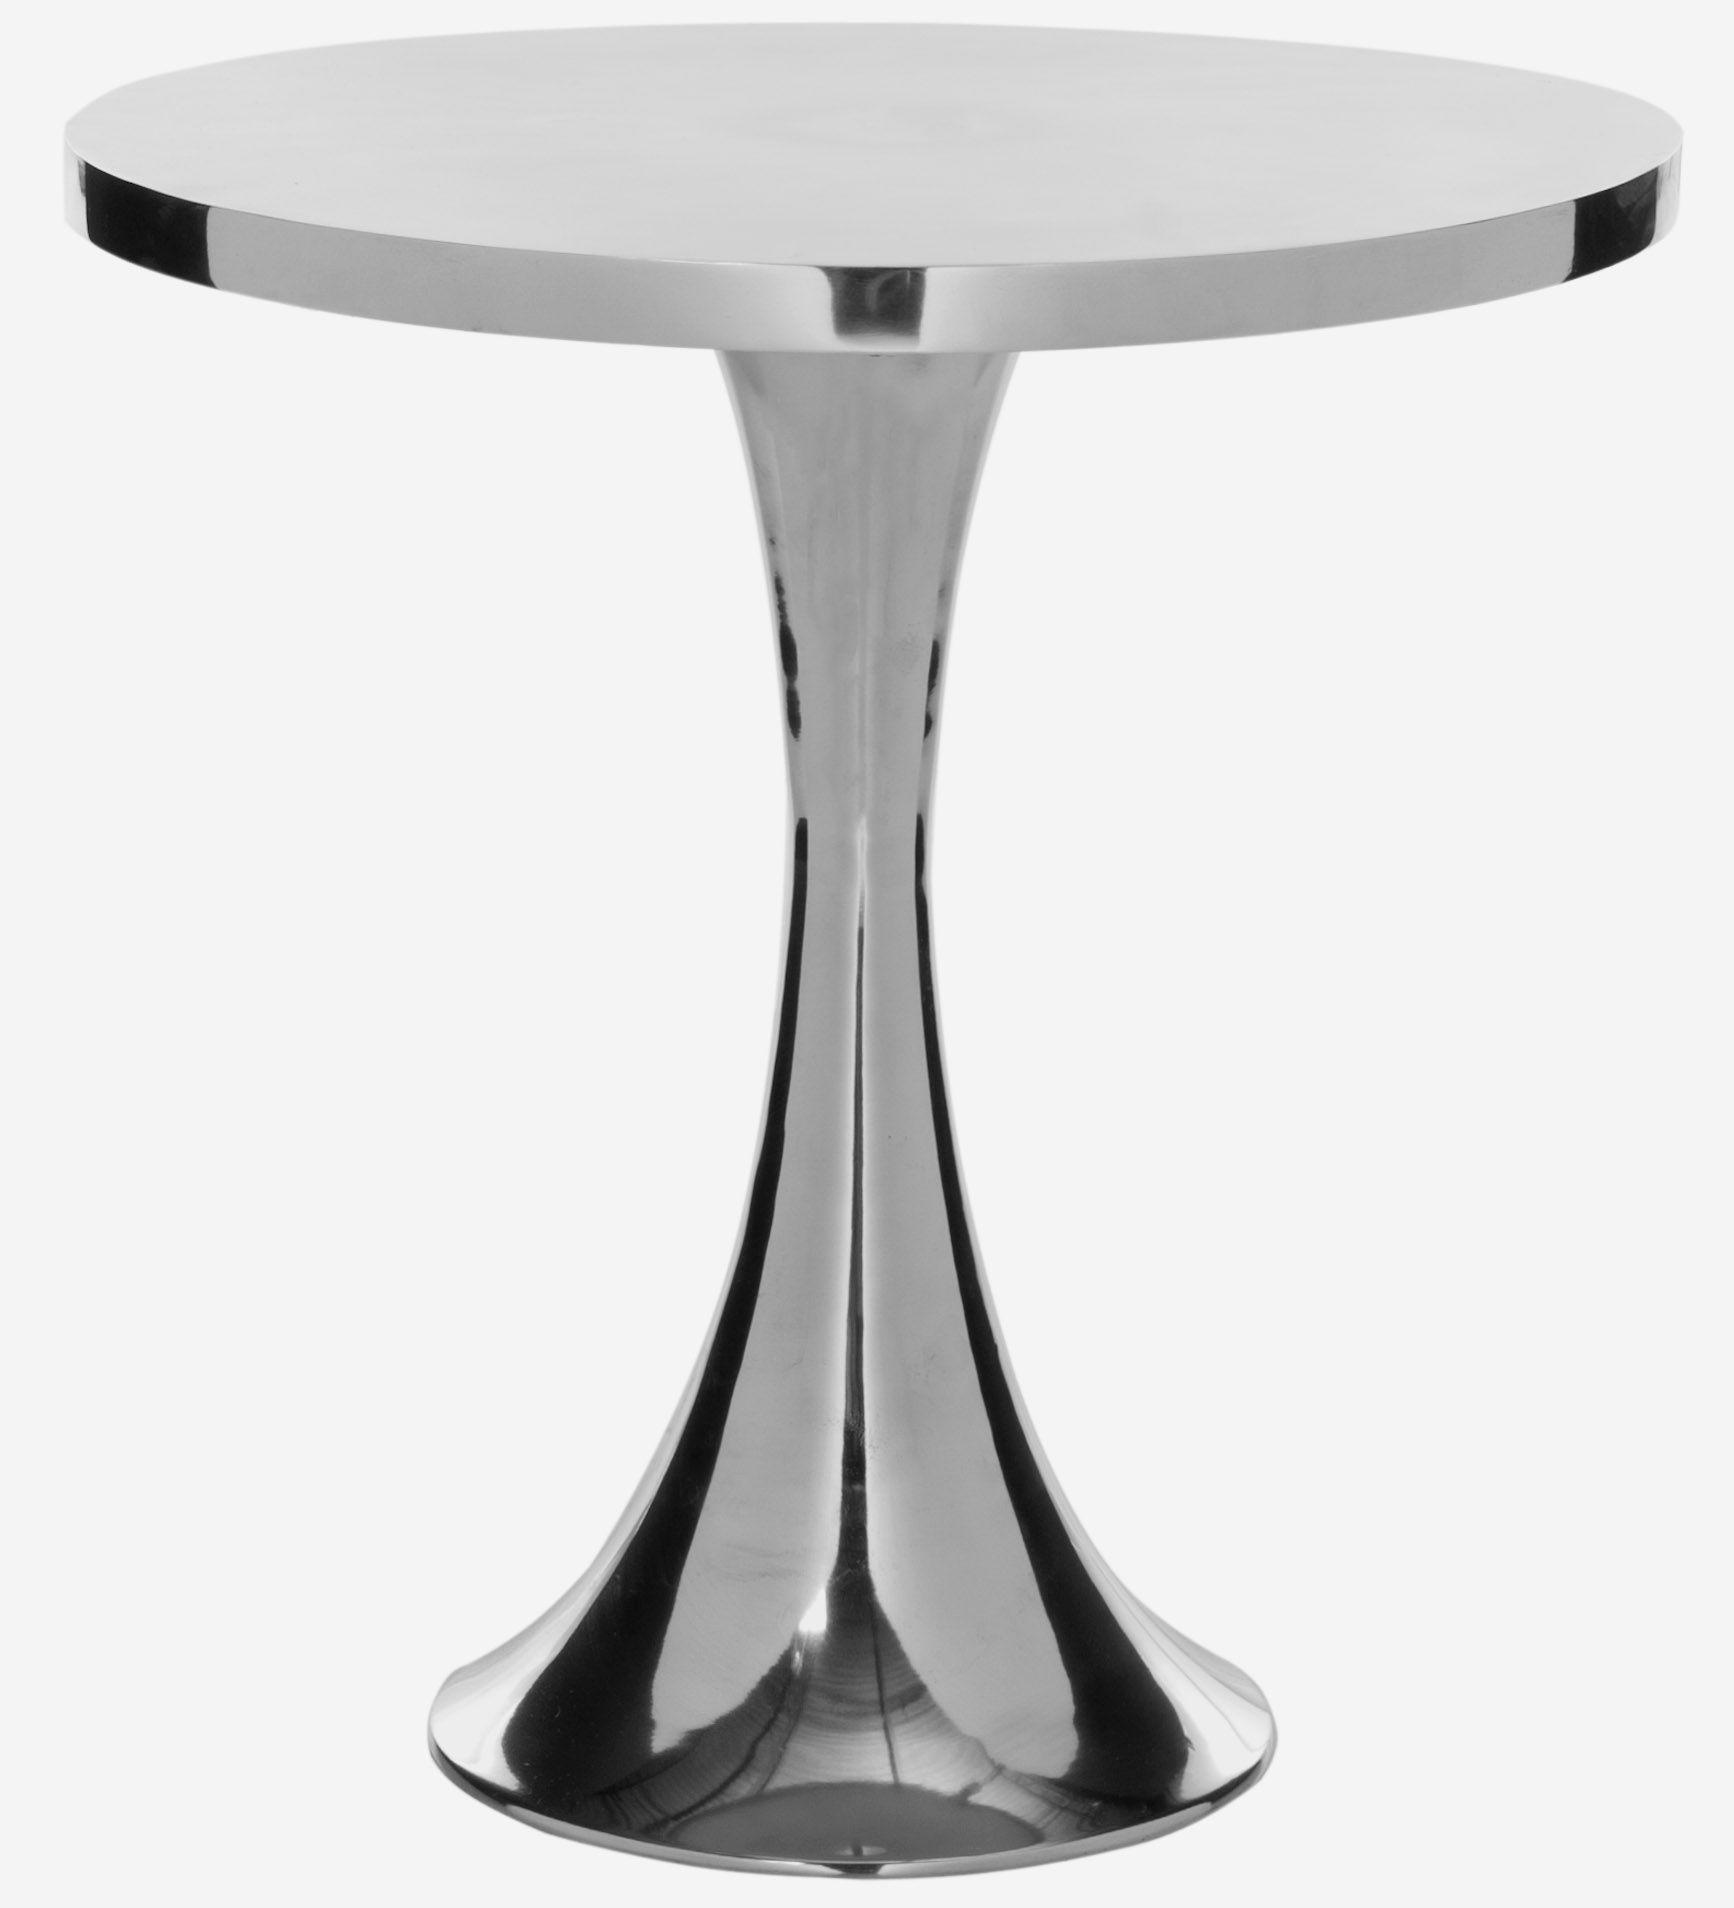 0d9ffac1e38d0219990ea2eb3f3b31e5 Top Result 50 Luxury Black and White Coffee Table Image 2017 Shdy7